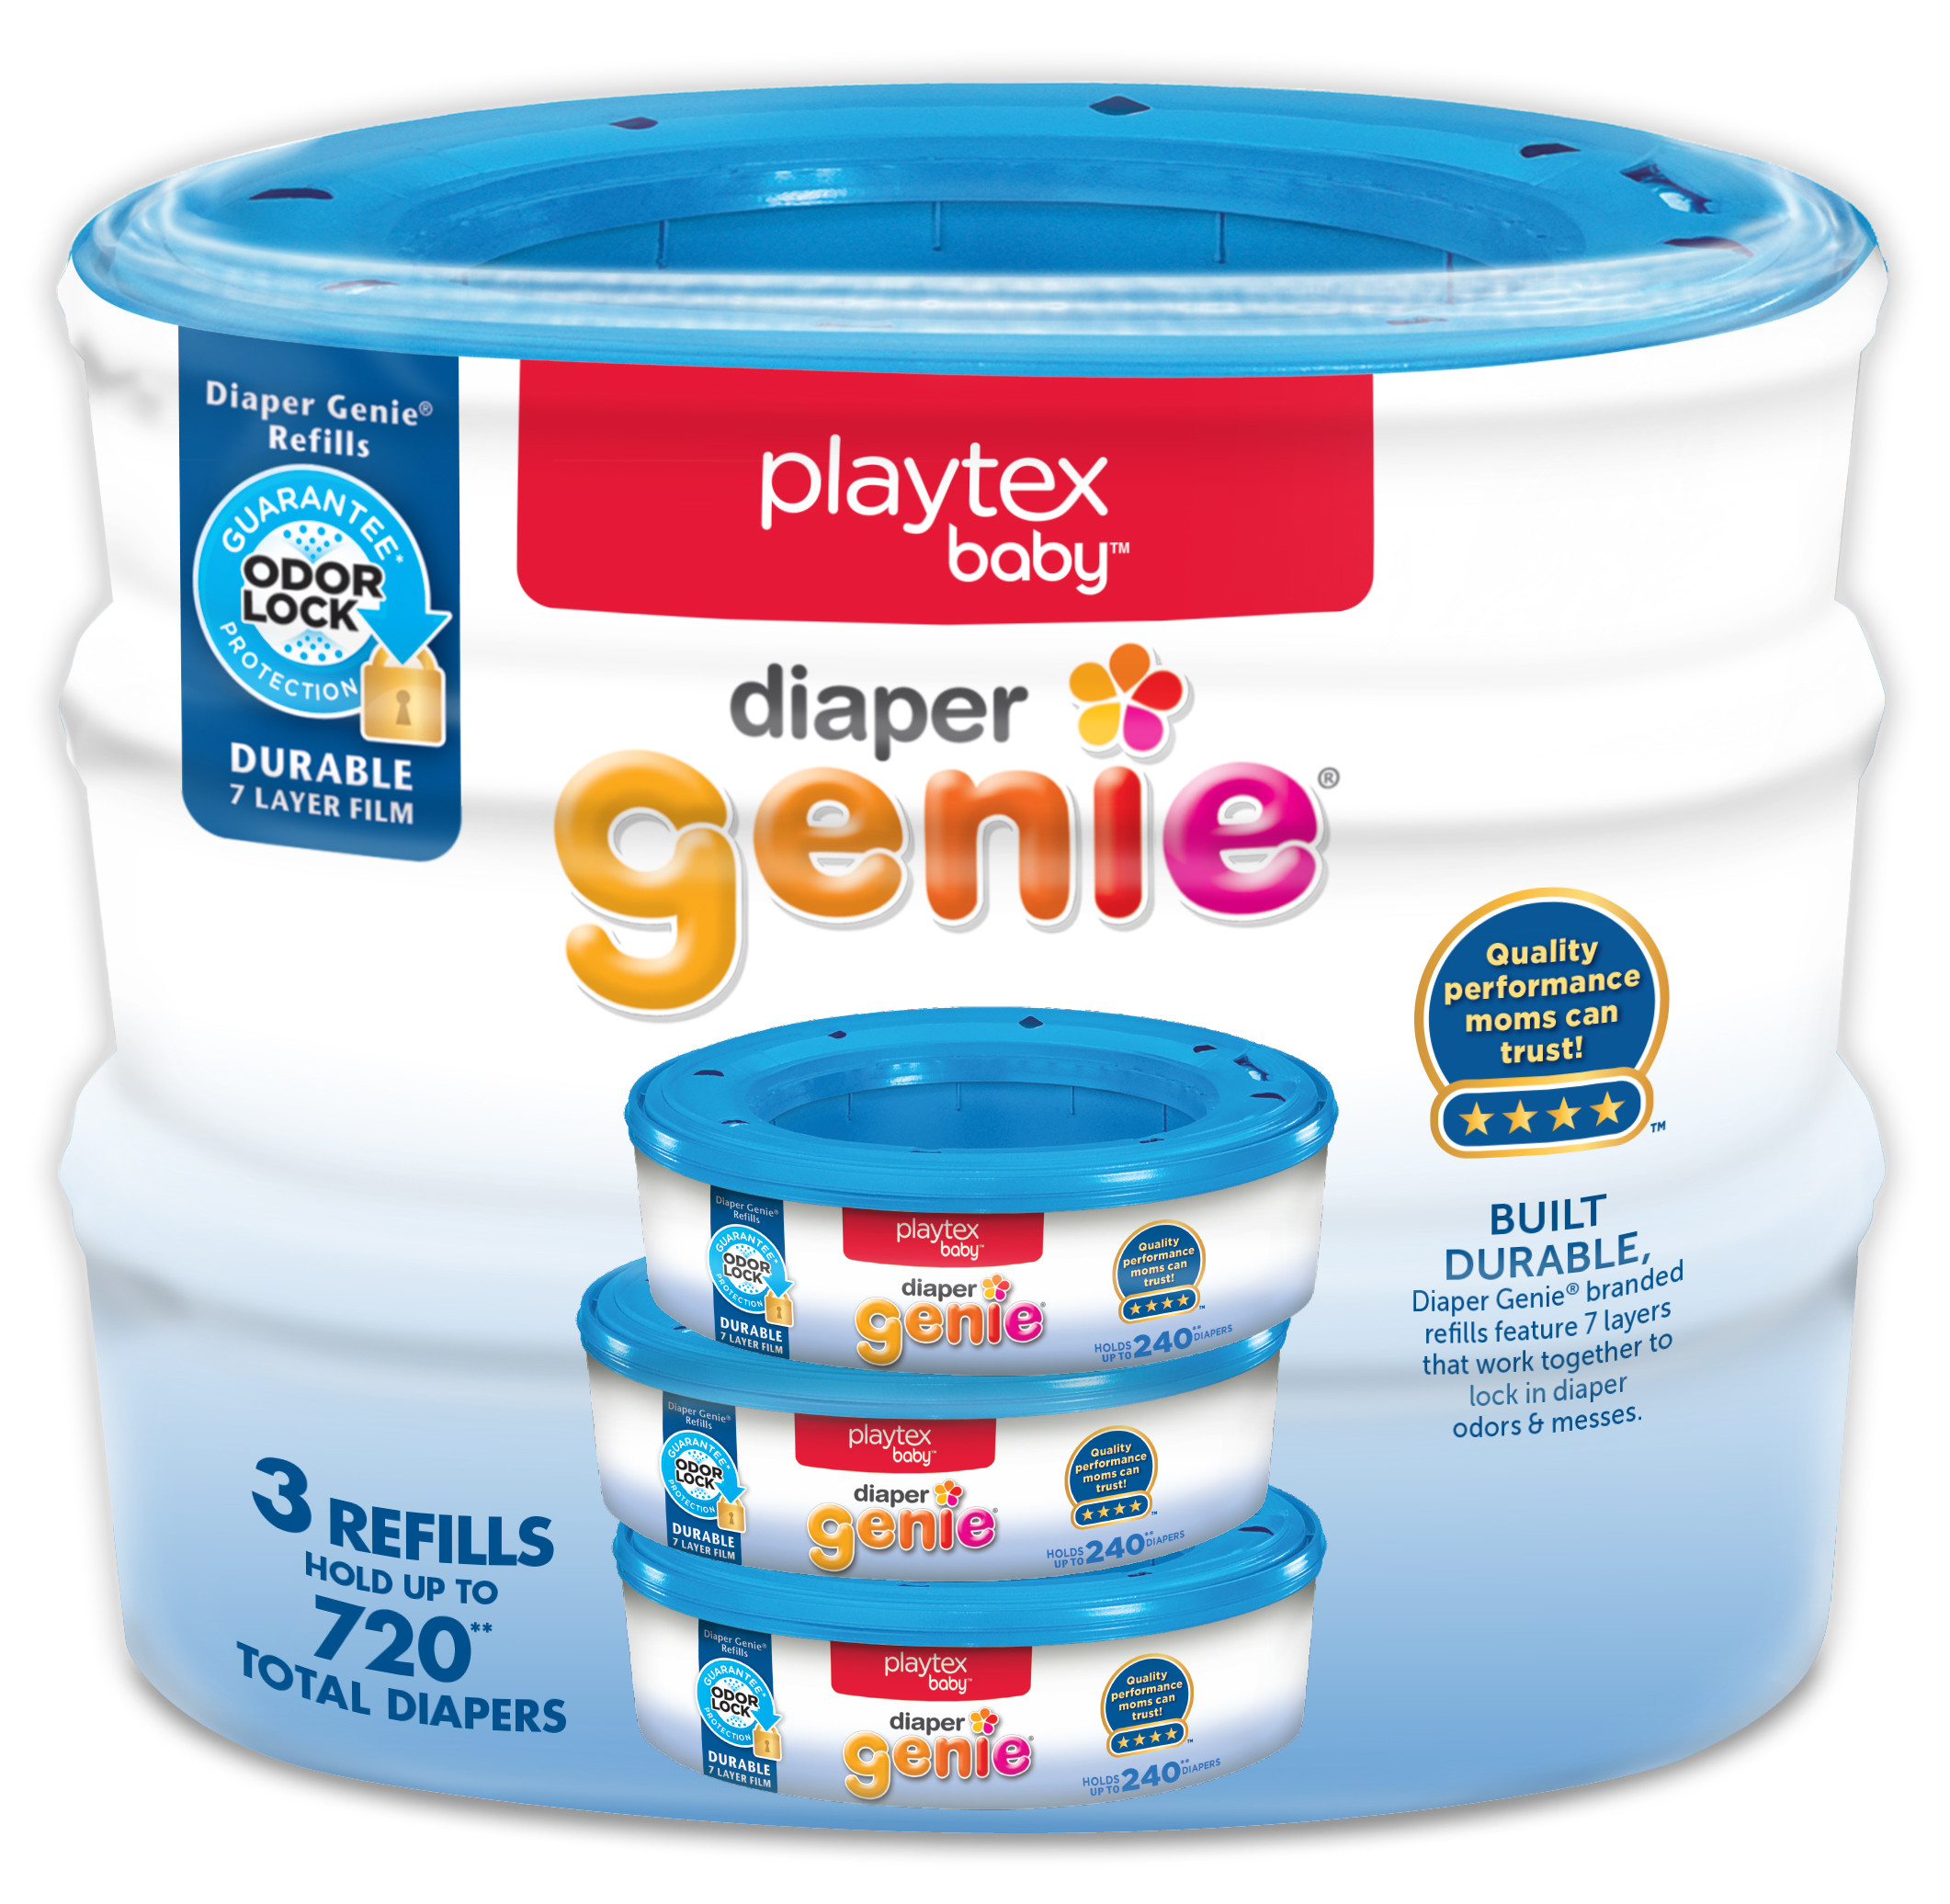 Playtex Diaper Genie Refills for Diaper Genie Diaper Pails - 3 Count